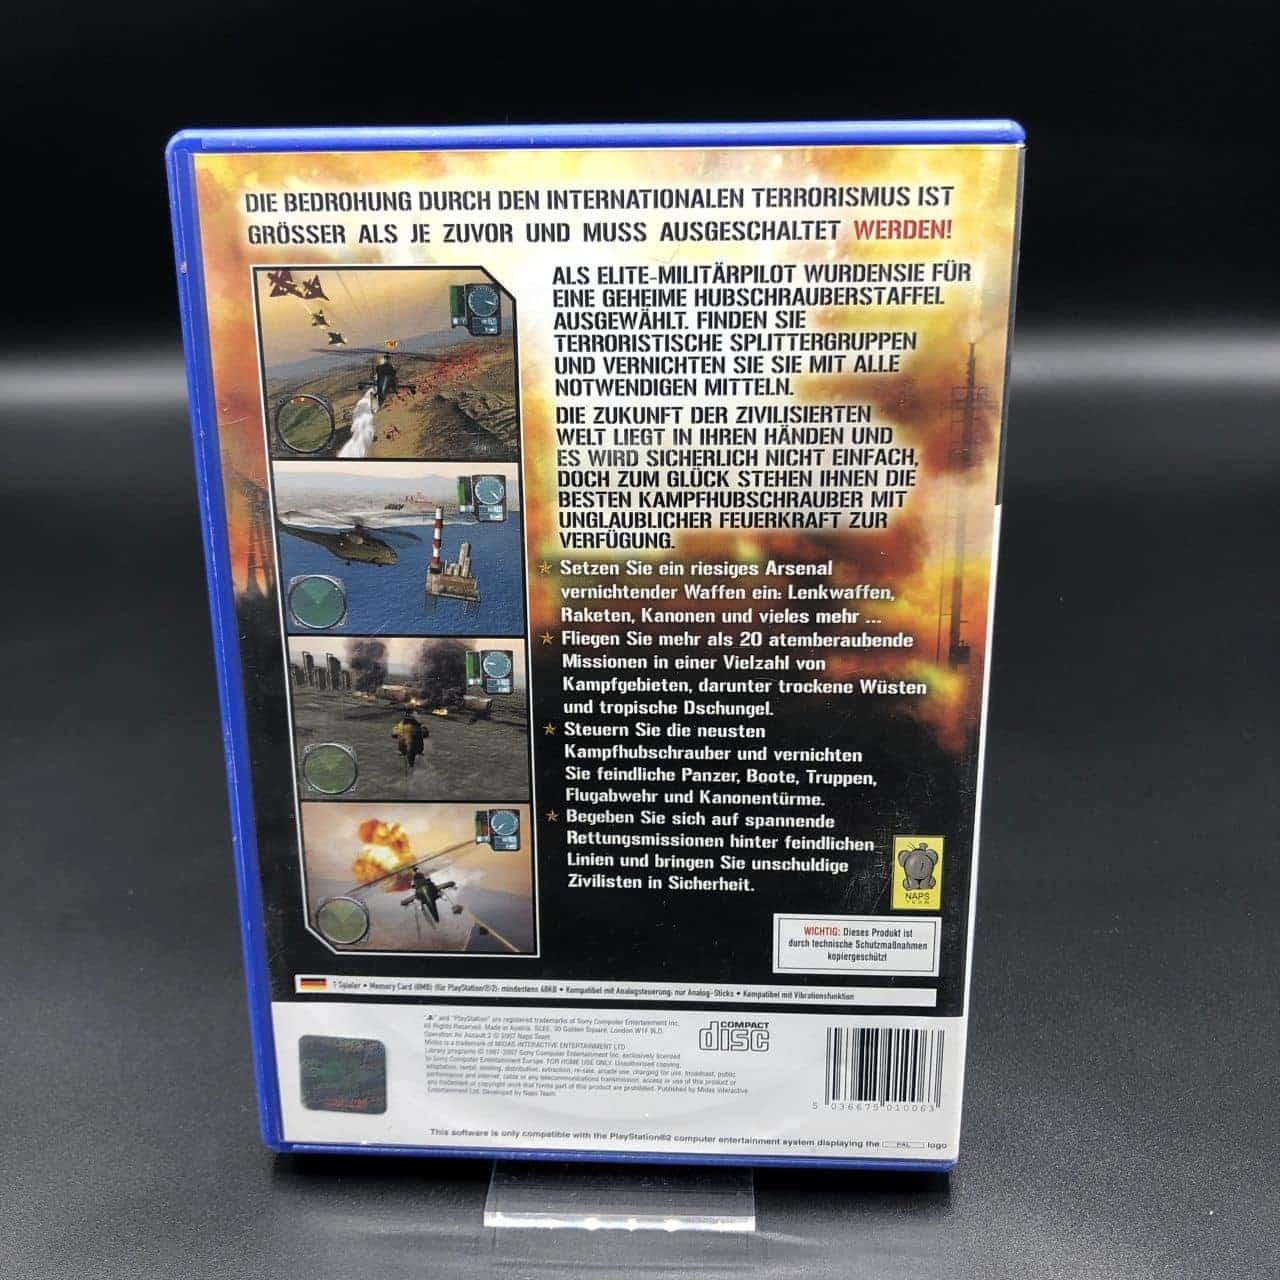 PS2 Operation Air Assault 2 (Komplett) (Gebrauchsspuren) Sony PlayStation 2